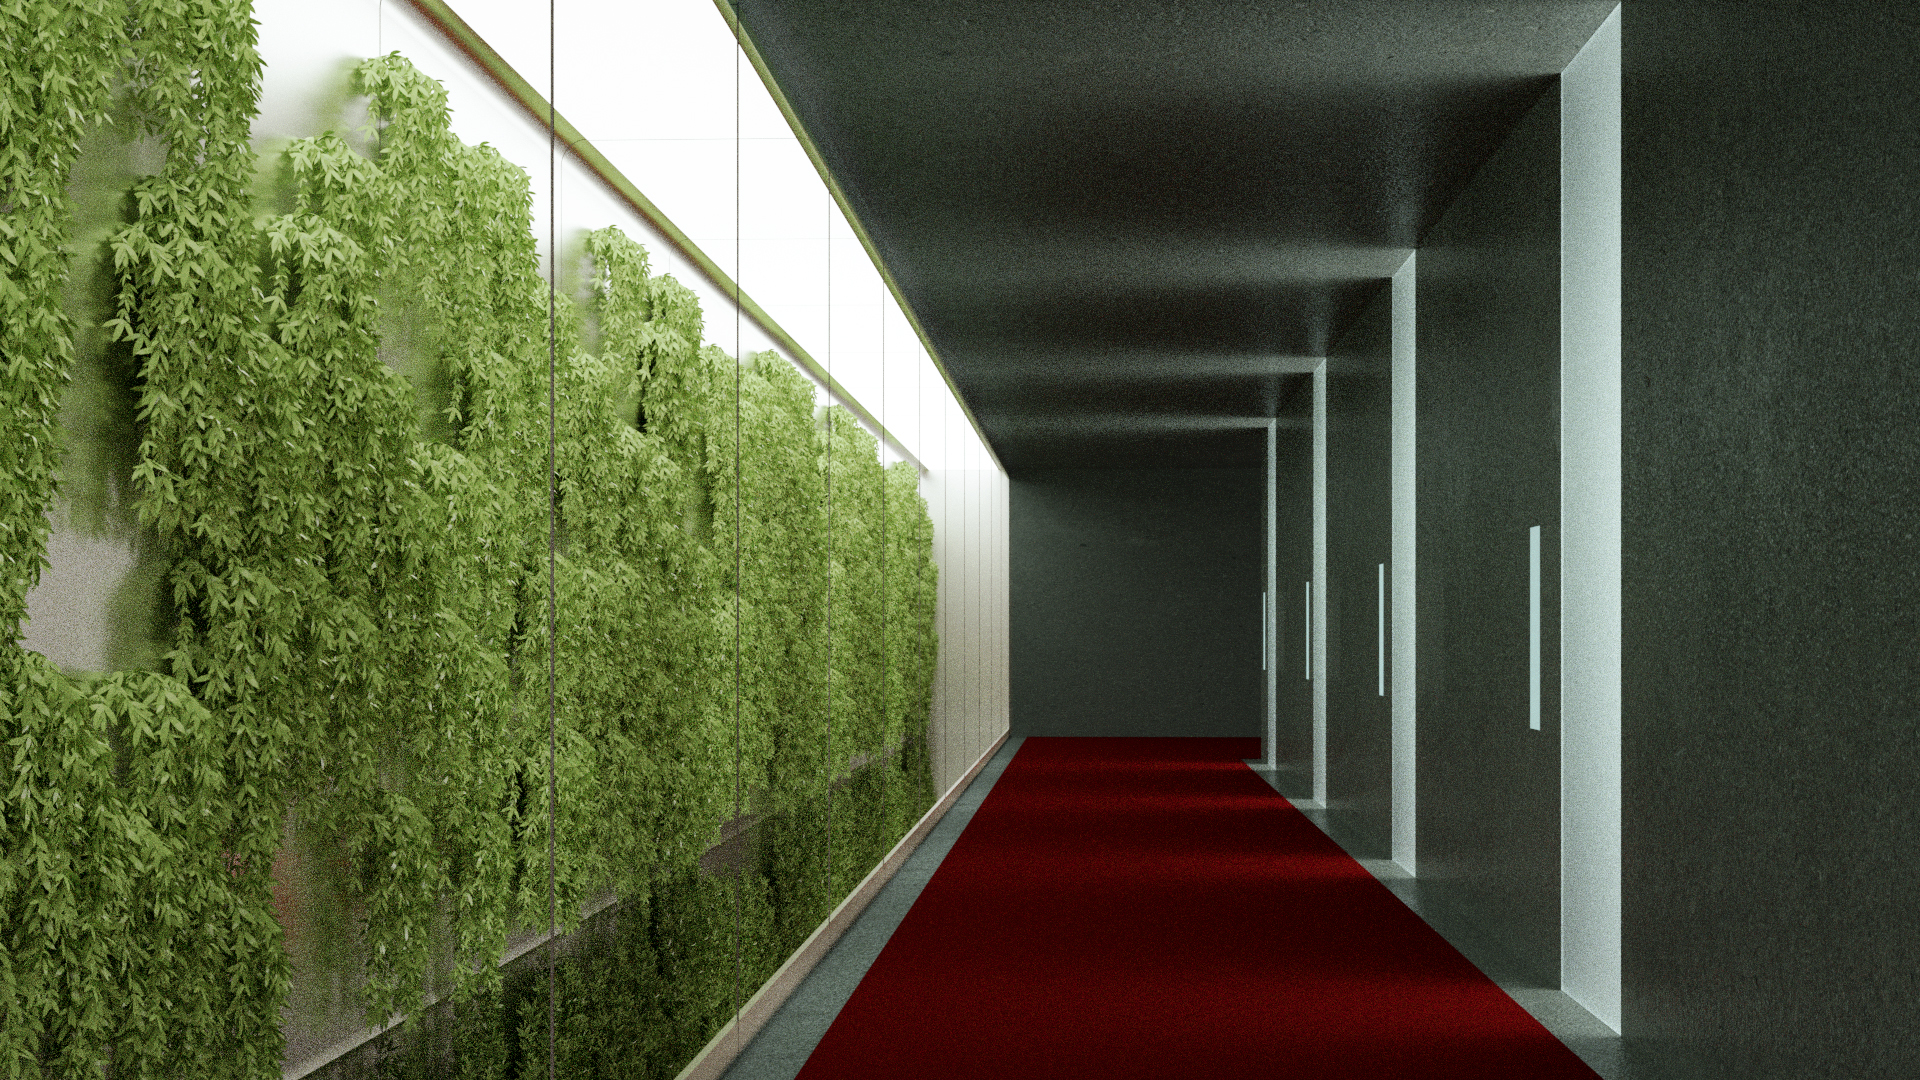 k18d machina wall.jpg